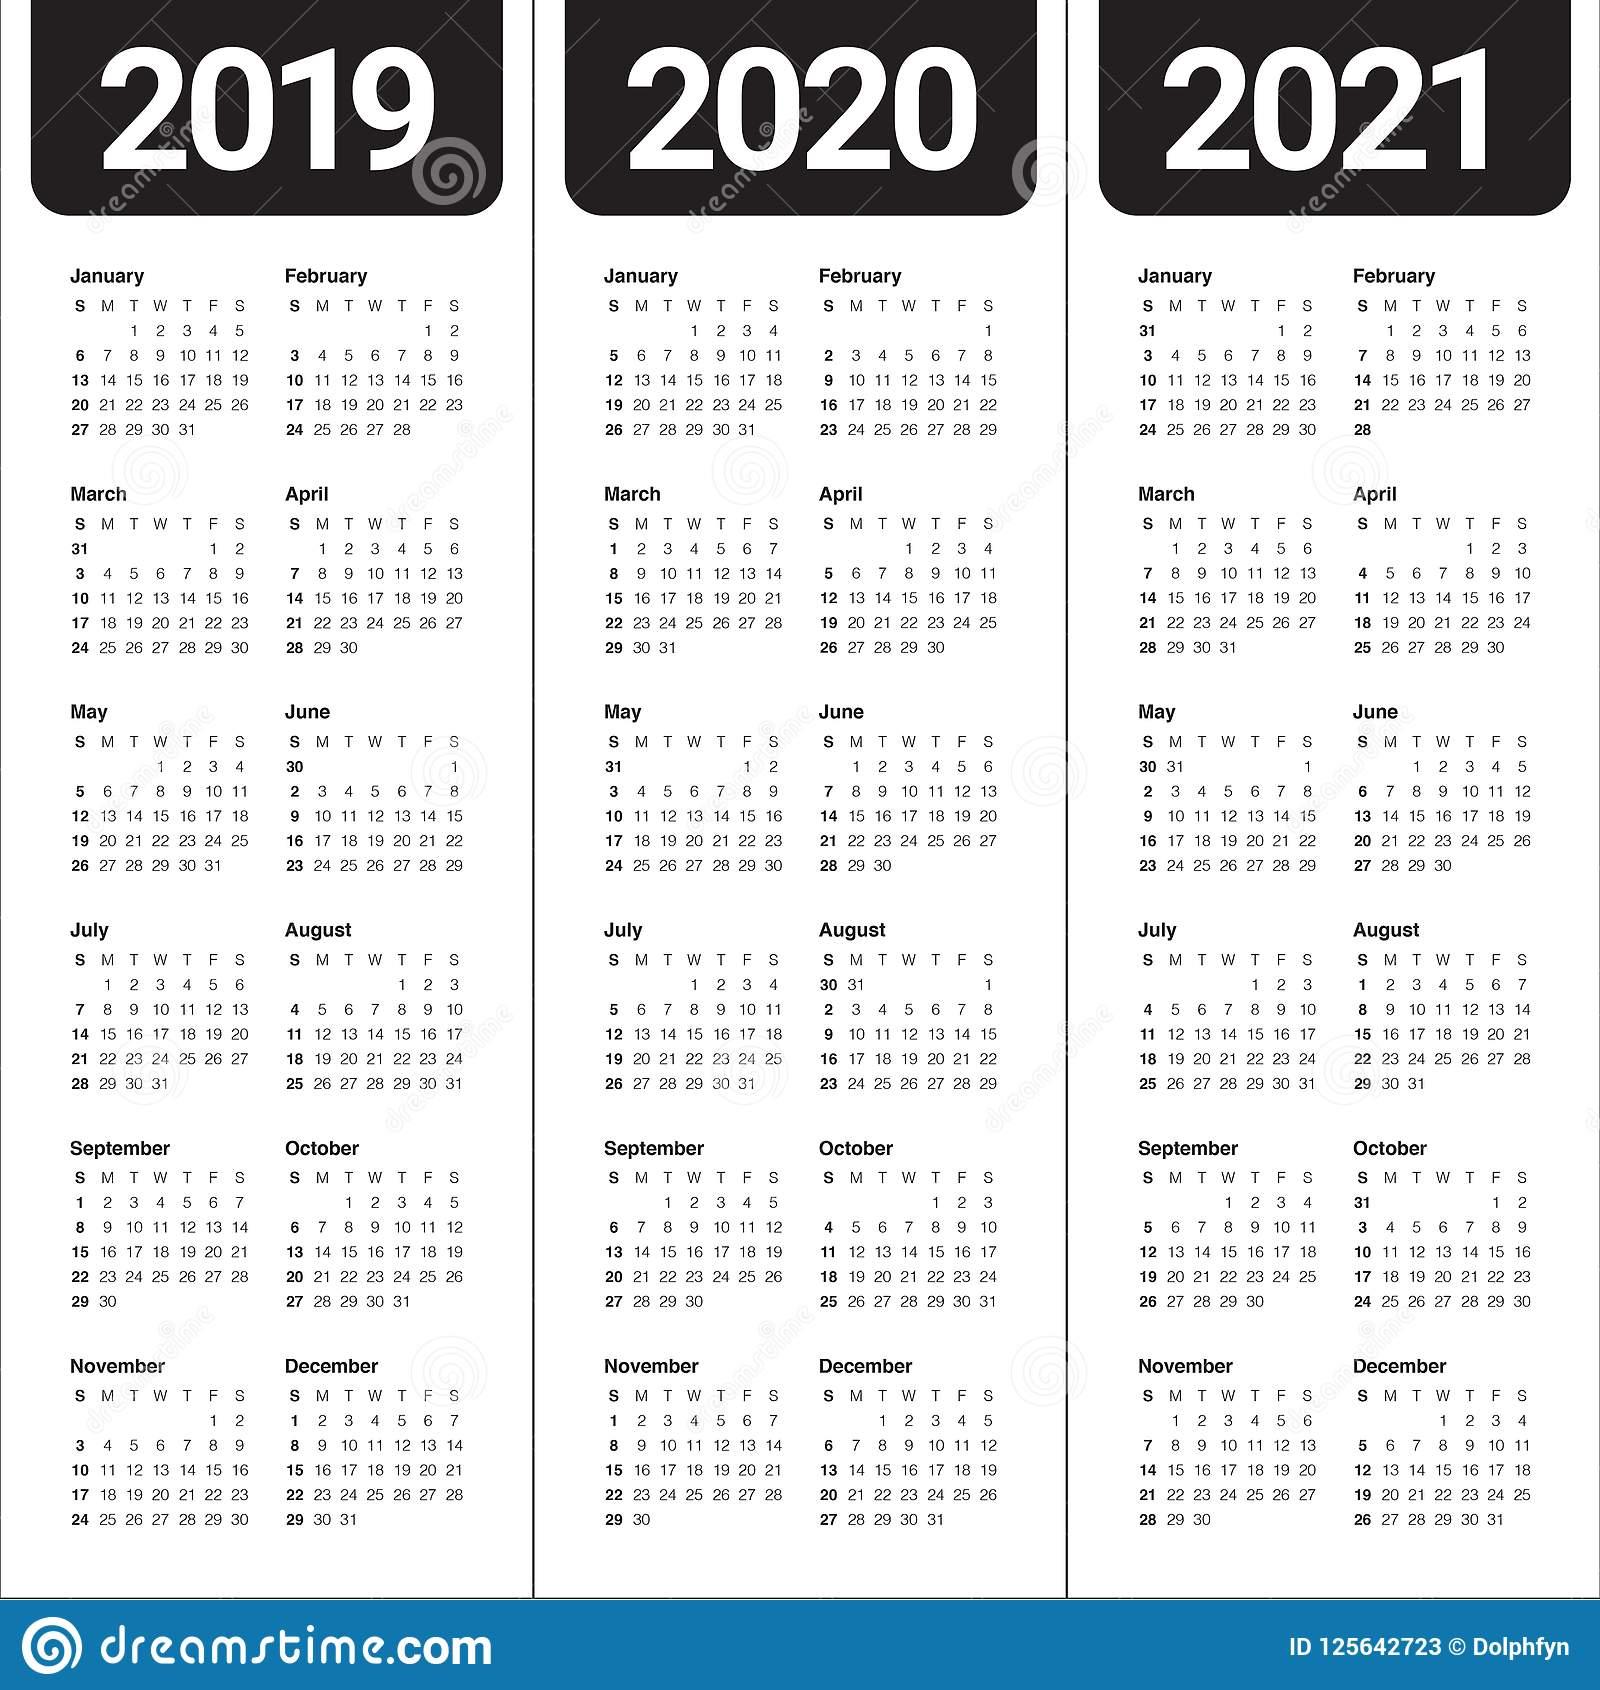 Calendar 2020 And 2021 Calendar Ideas Design Creative 1